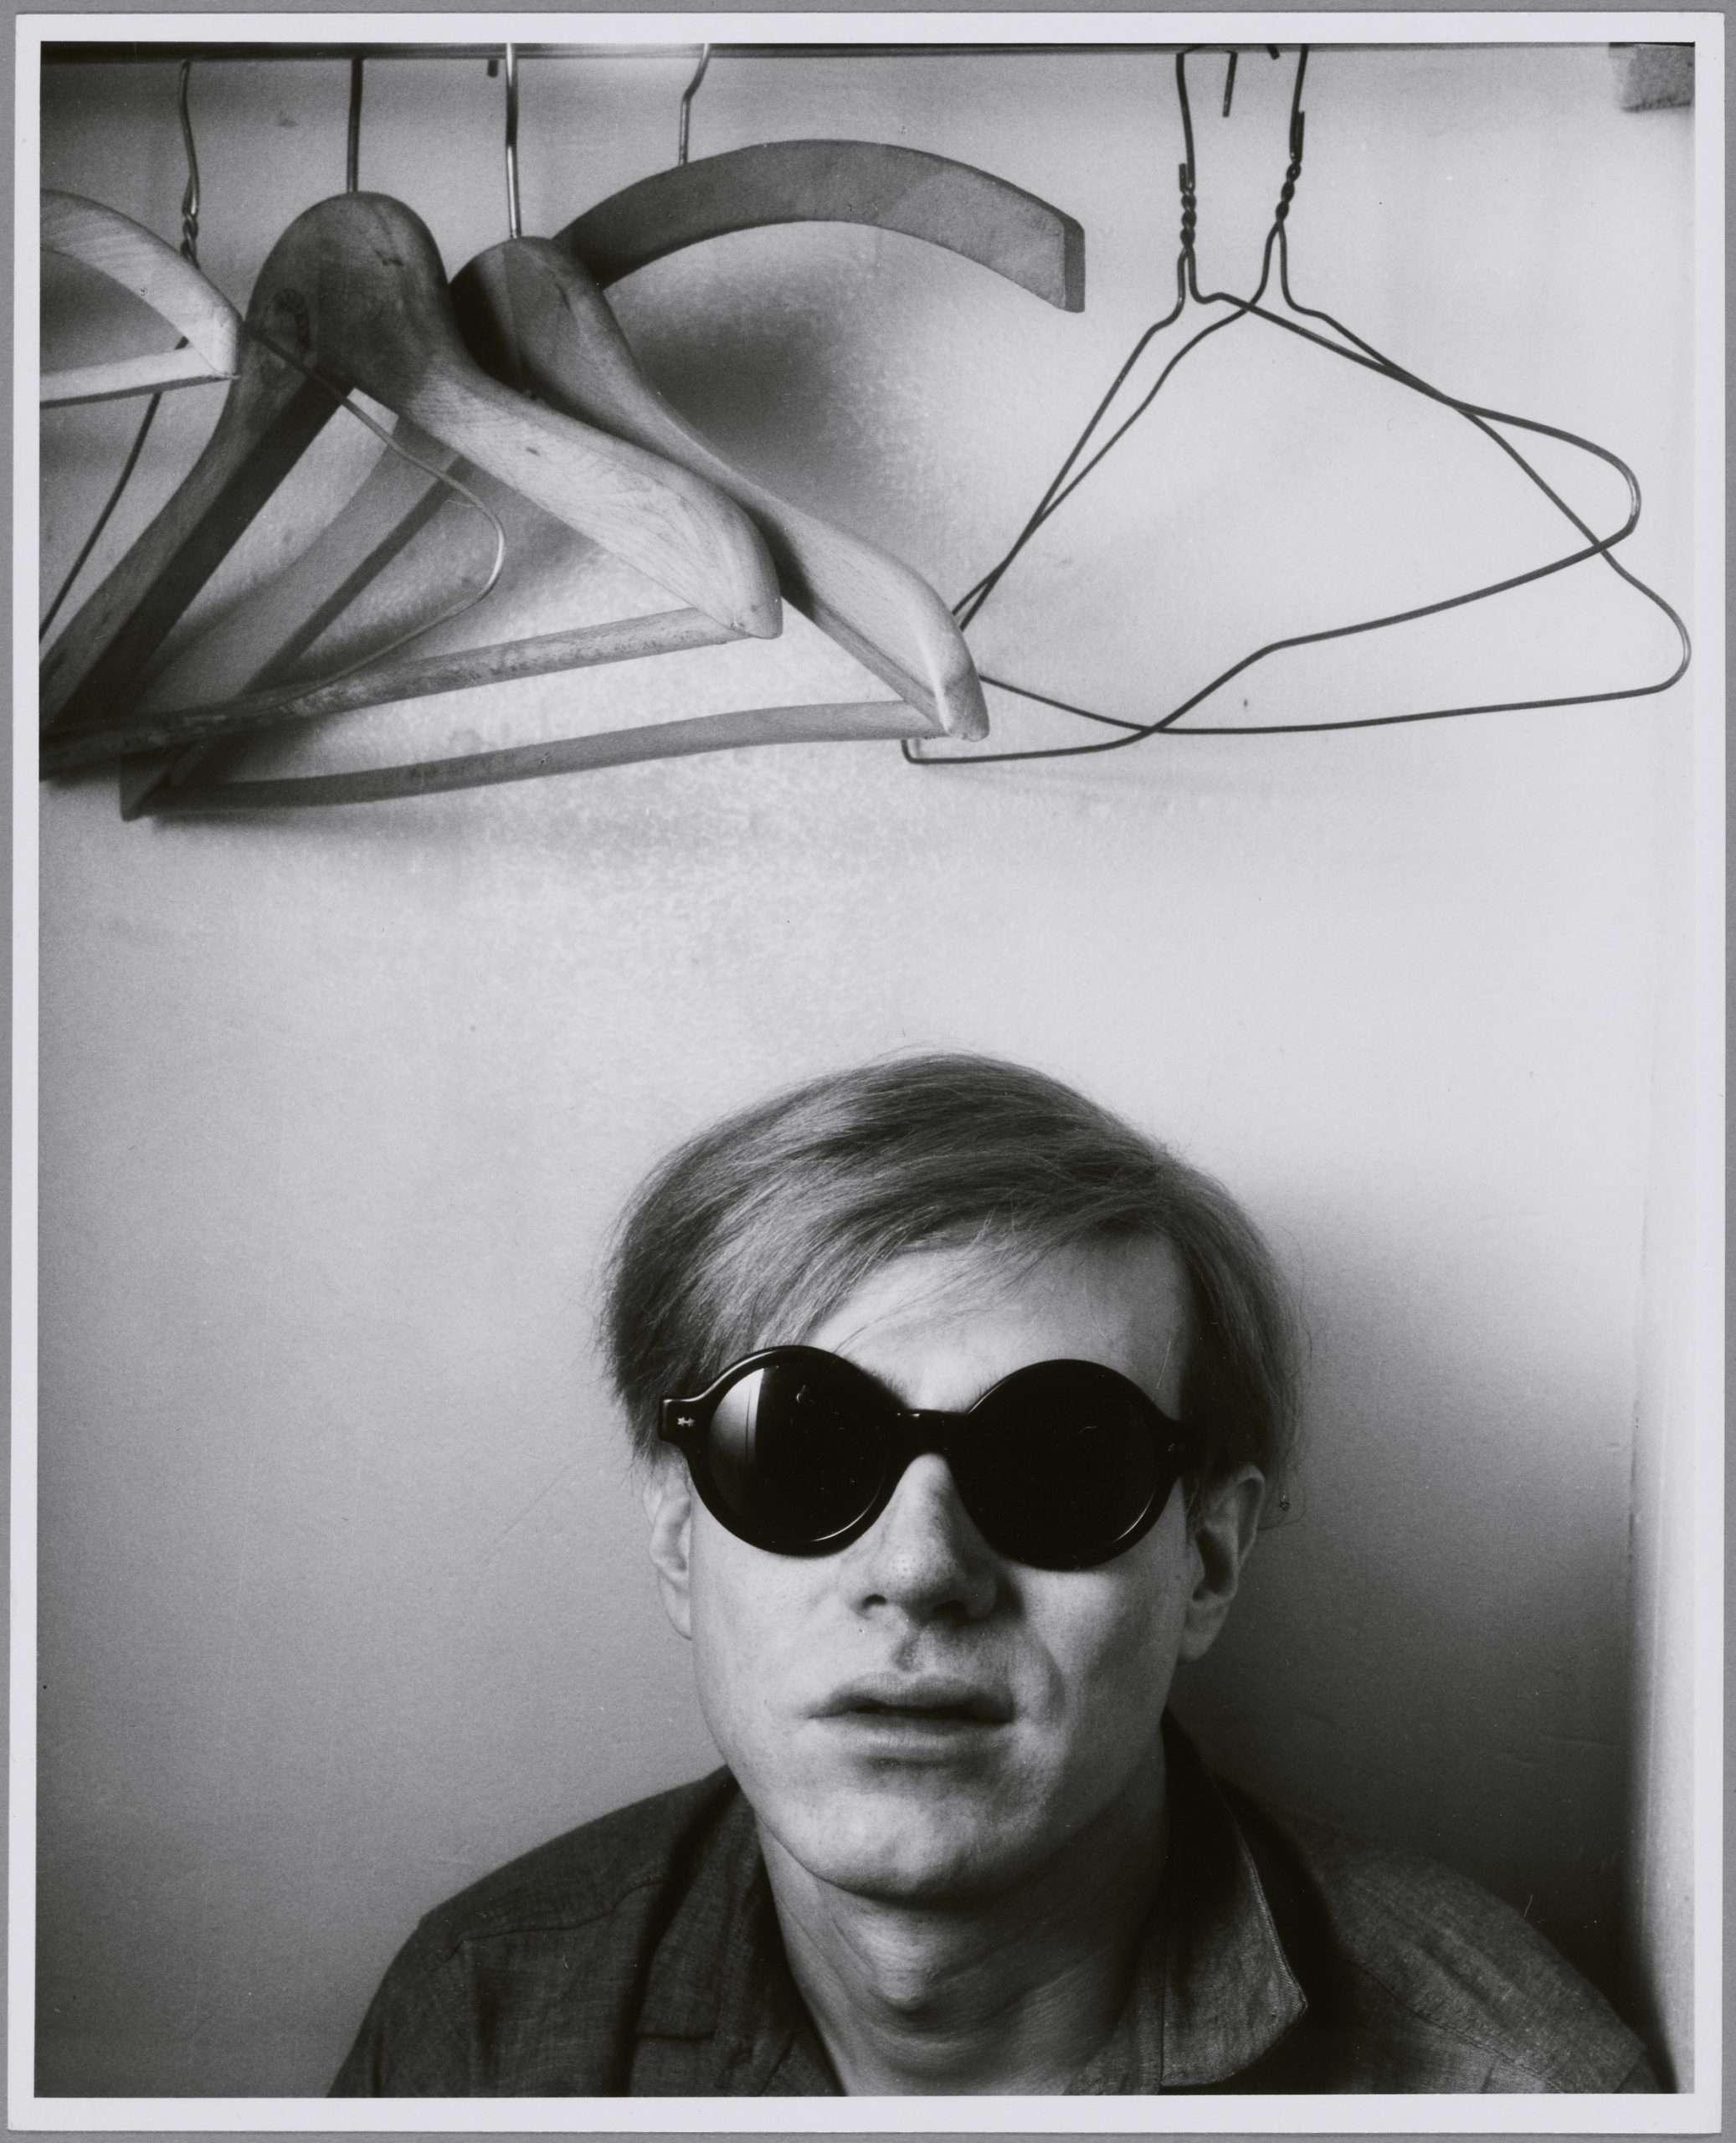 03. Shunk-Kender_Andy Warhol, Parigi, 1965